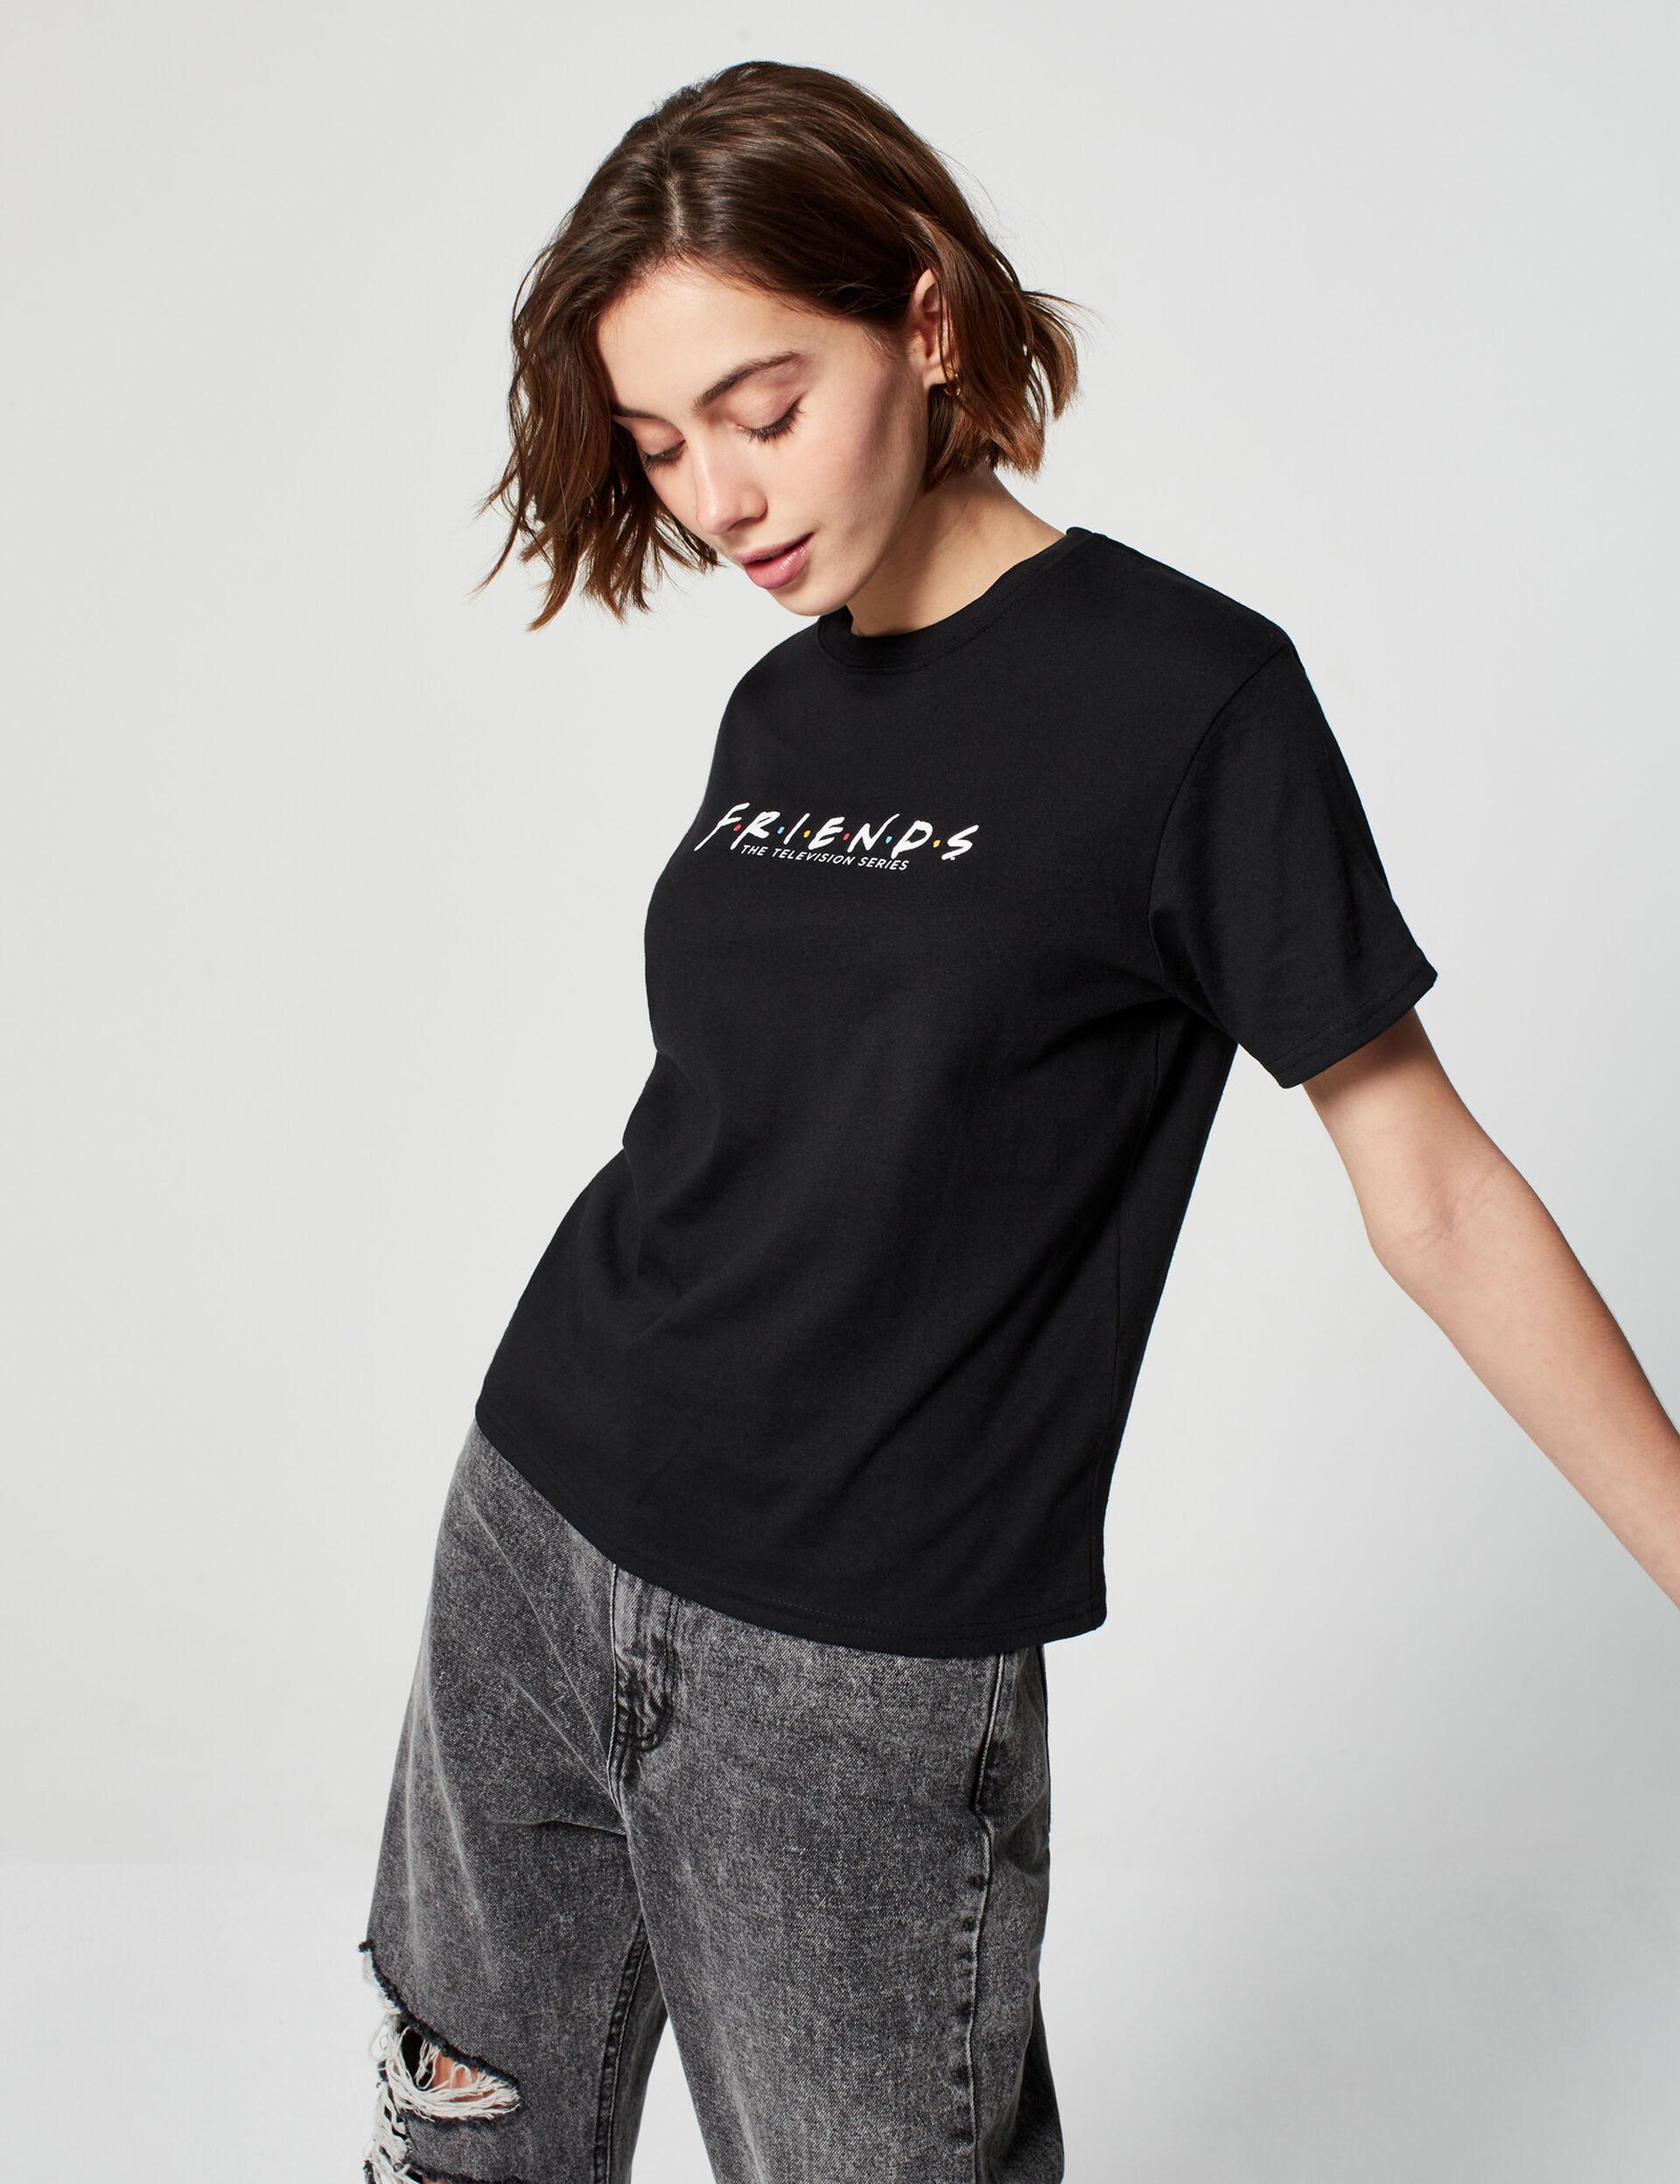 Tee-shirt F.R.I.E.N.D.S